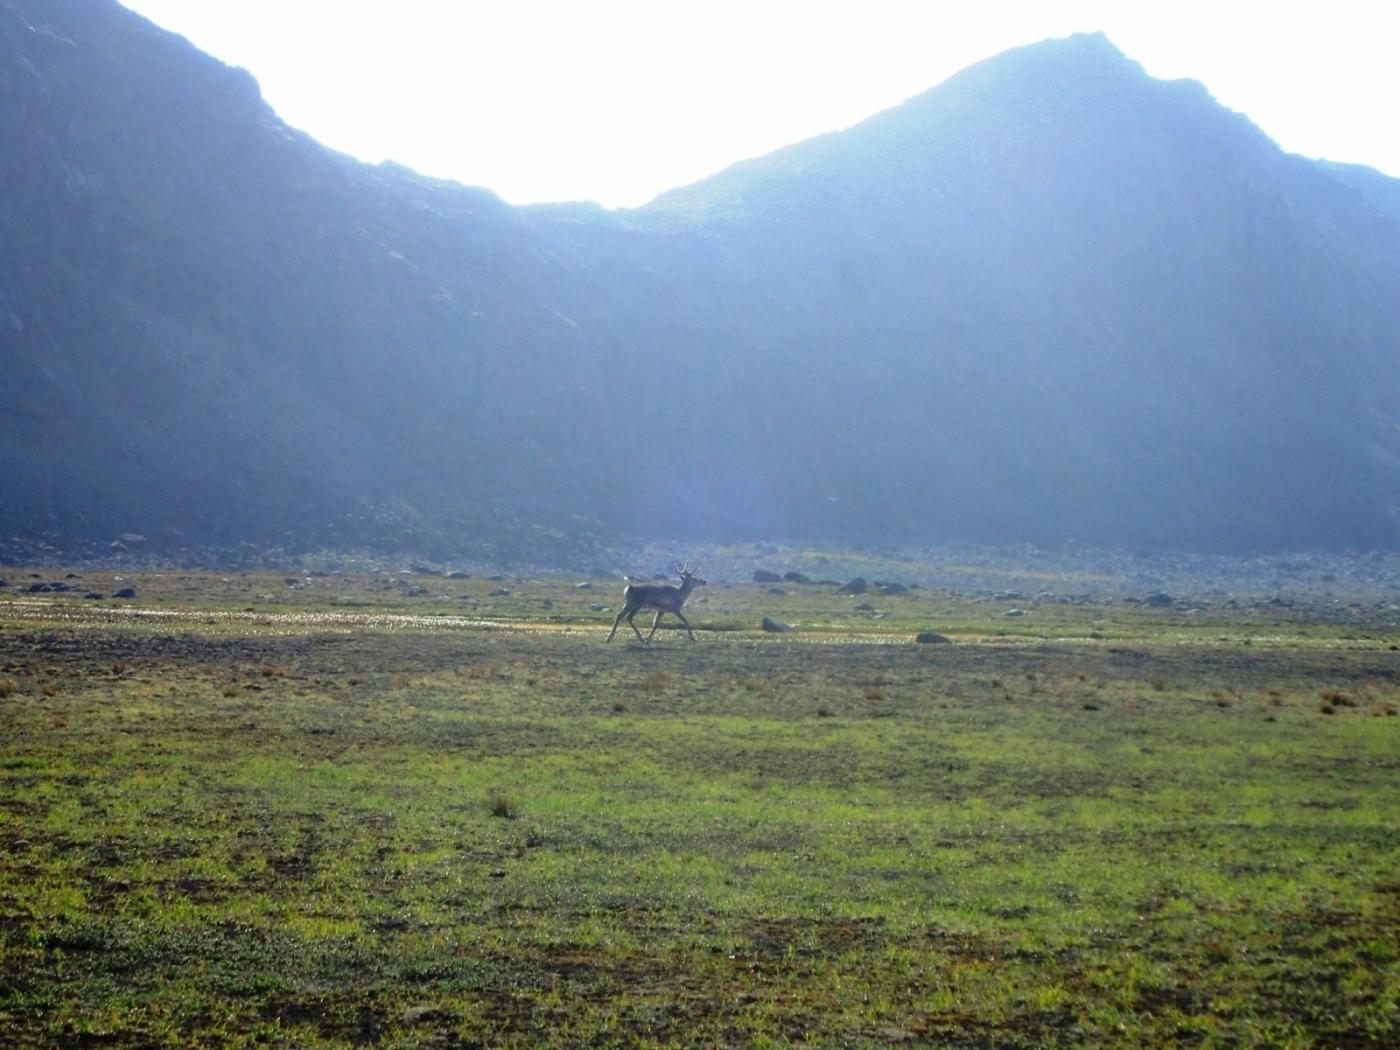 Sassannguit Native, the Inquisitive Reindeer. Photo by Allan Liddle.